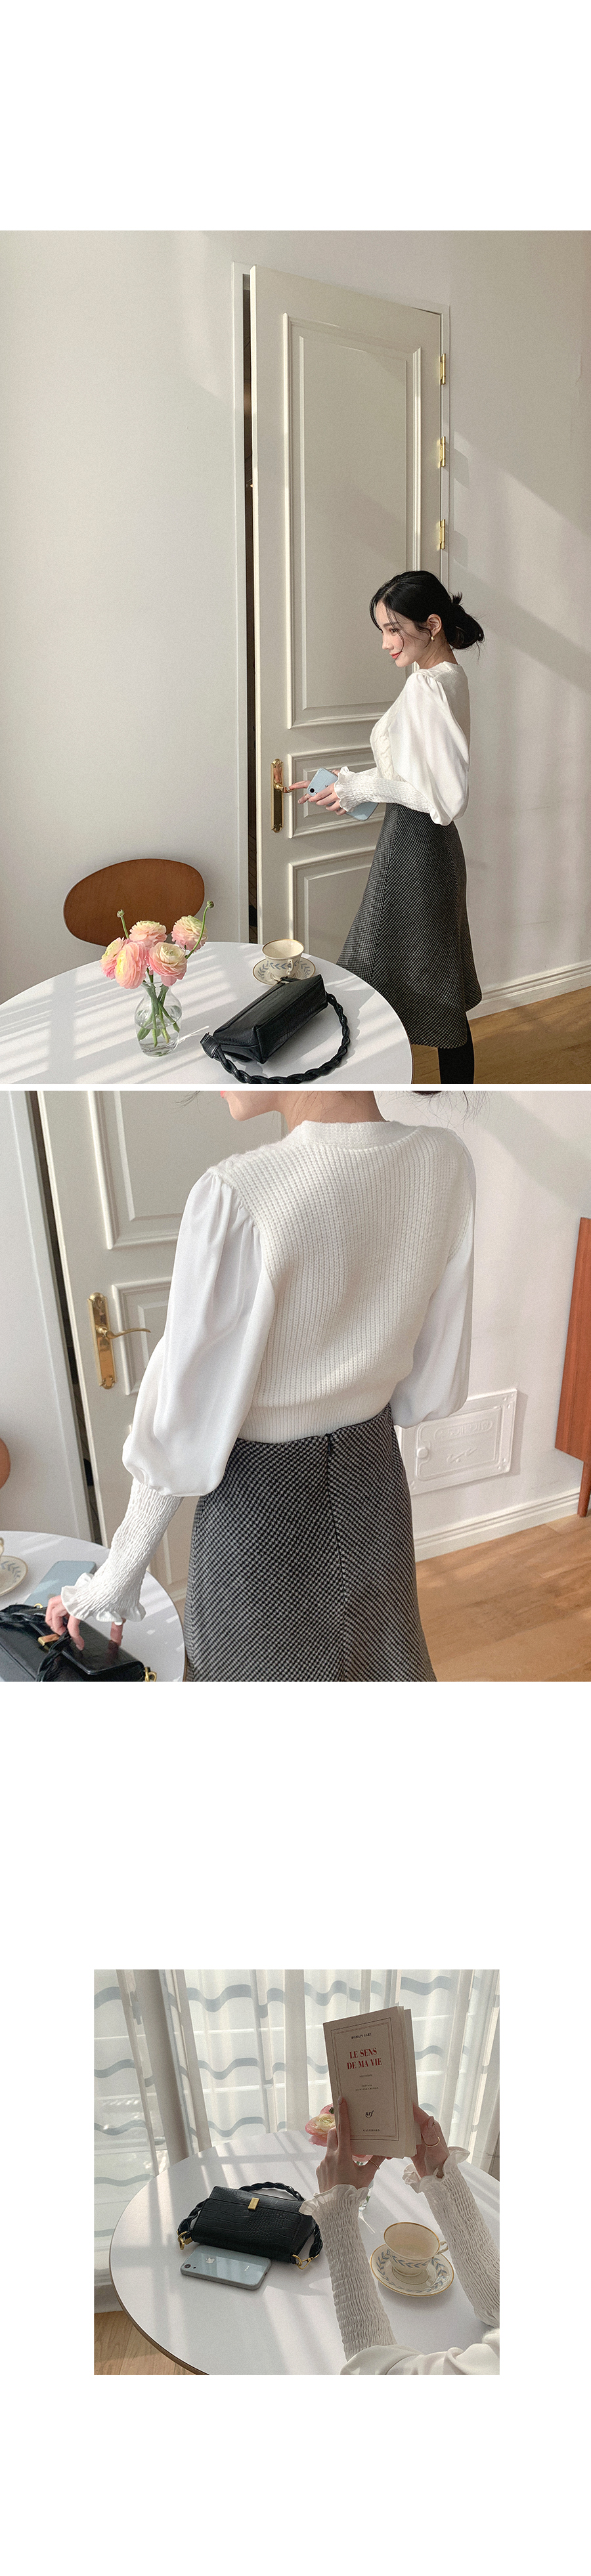 Different Knit Color Chiffon Blouse